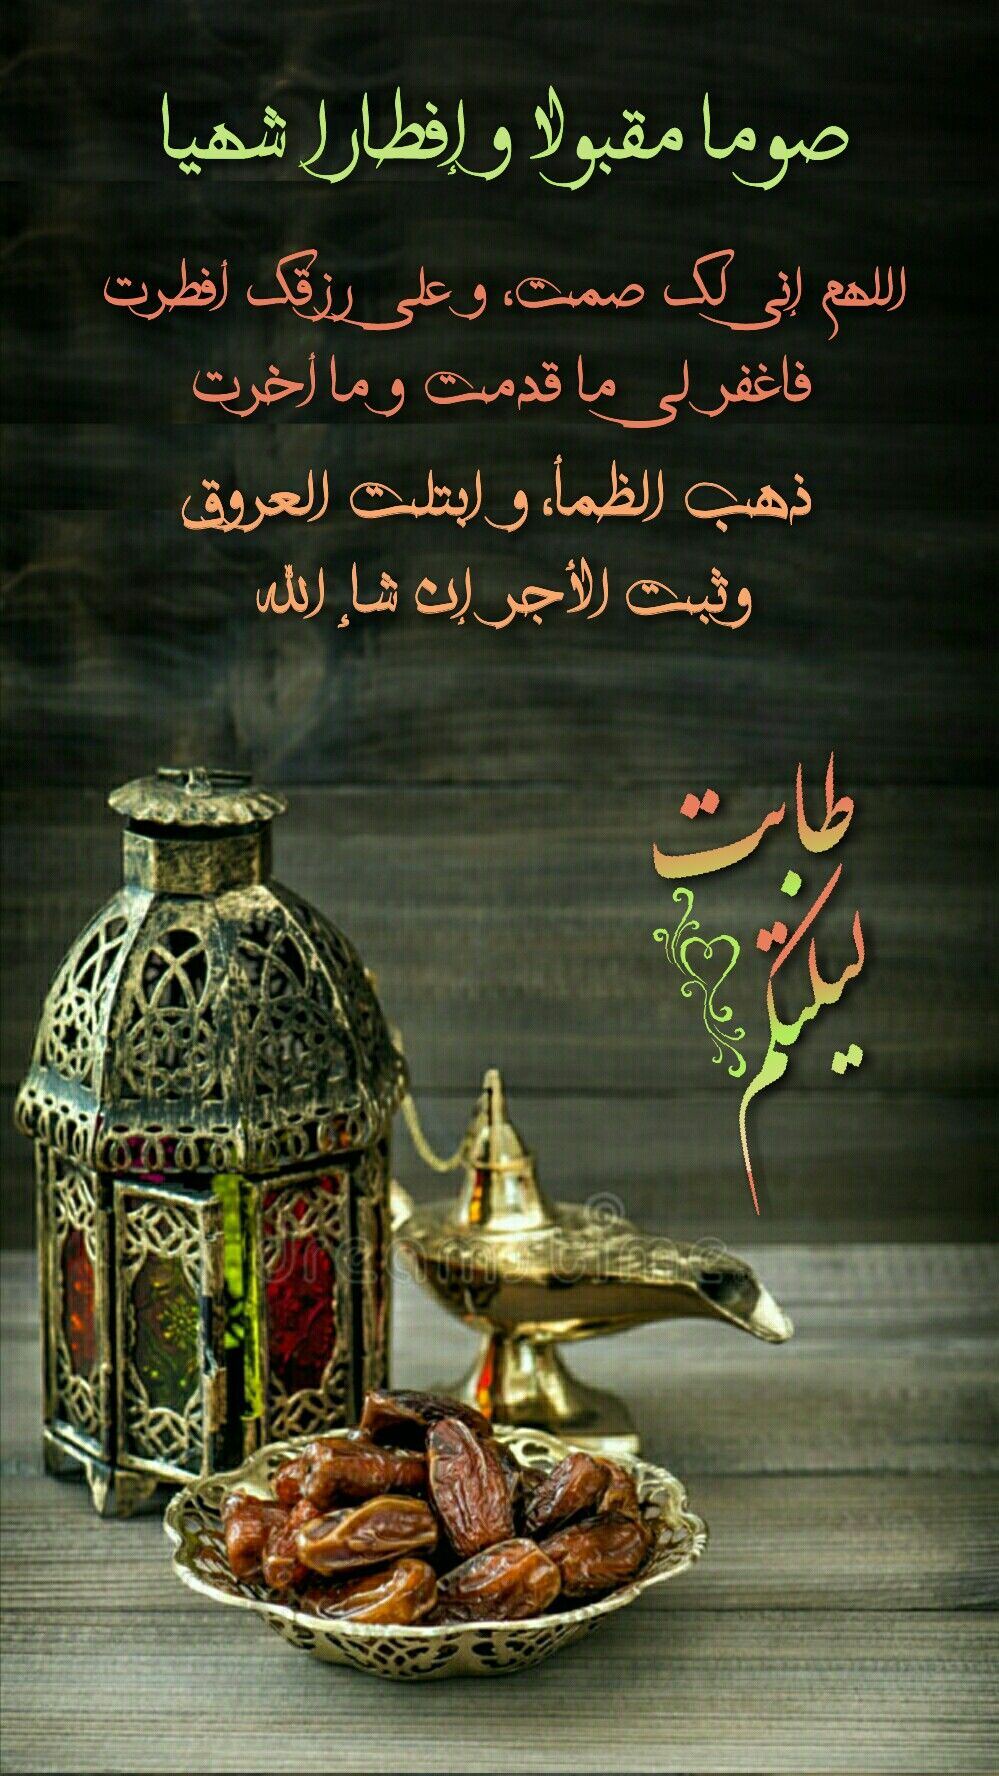 Pin By Sura Ejam On صباح الخير Ramadan Greetings Ramadan Ramadan Kareem